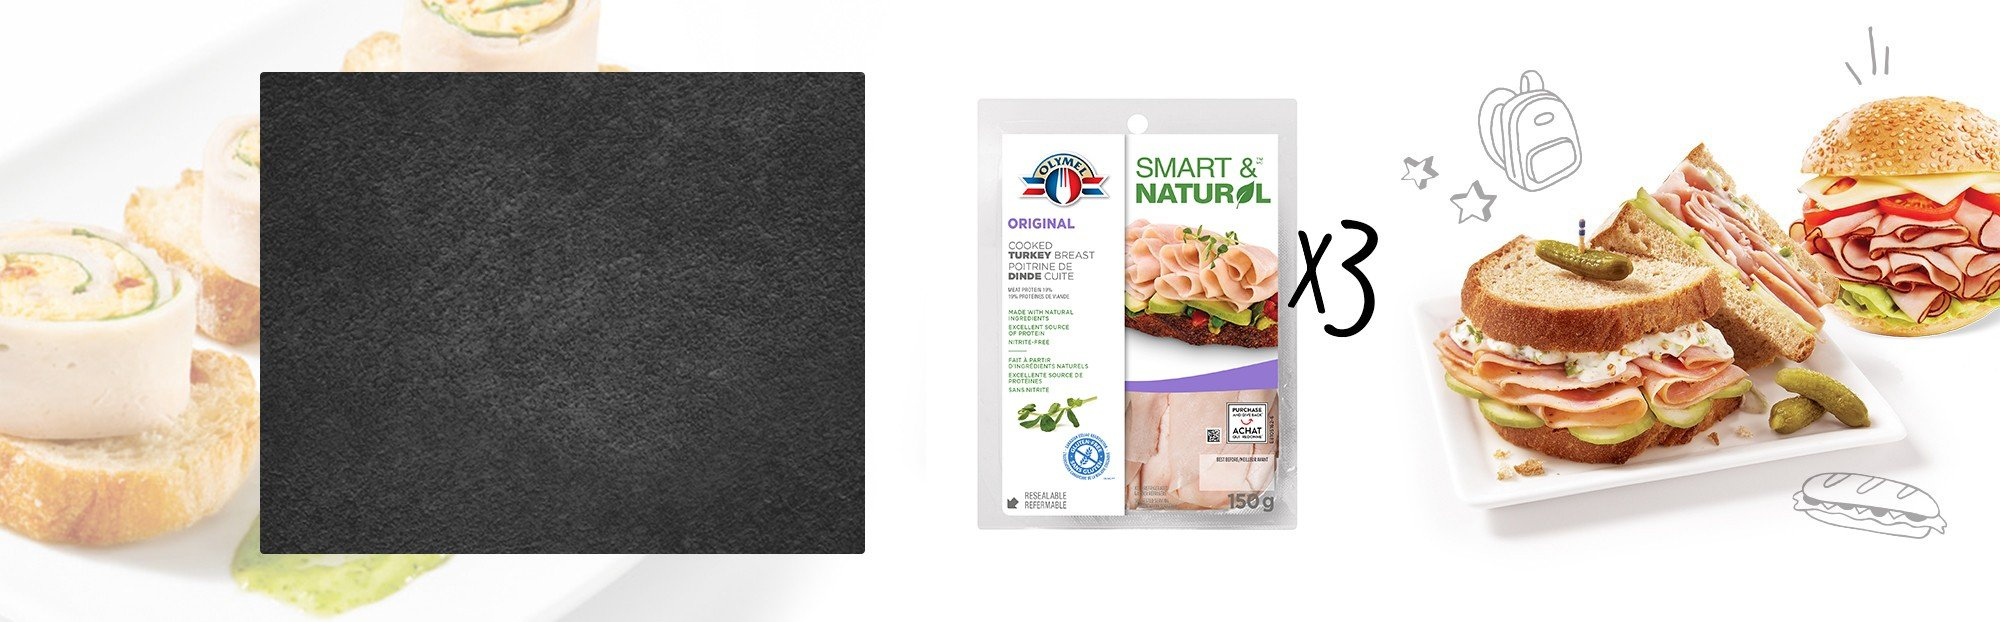 Poitrine de dindon cuite émincé Olymel Smart & Naturel - Trio Pack